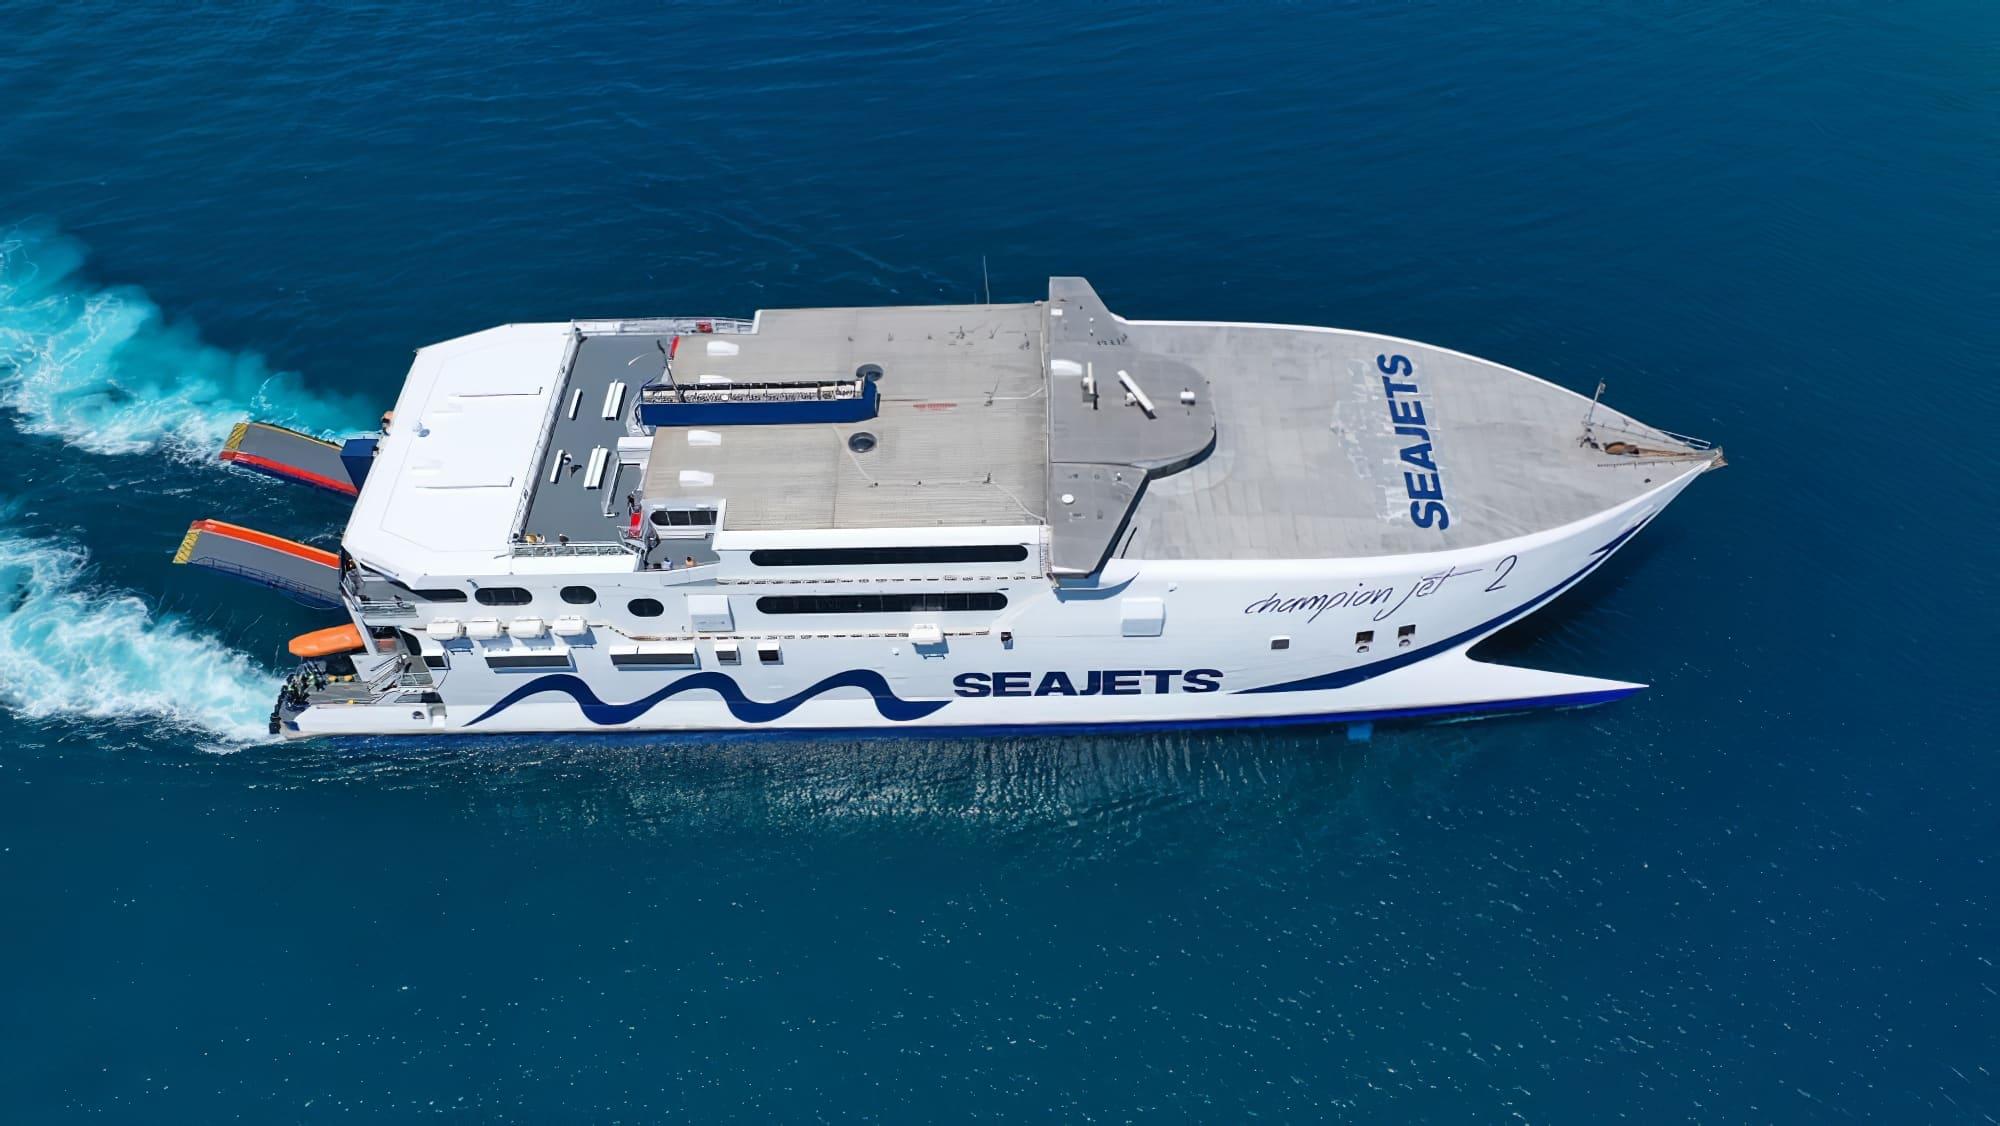 Ferry dans la Mer Egée, syros Amorgos depuis Santorin en ferry